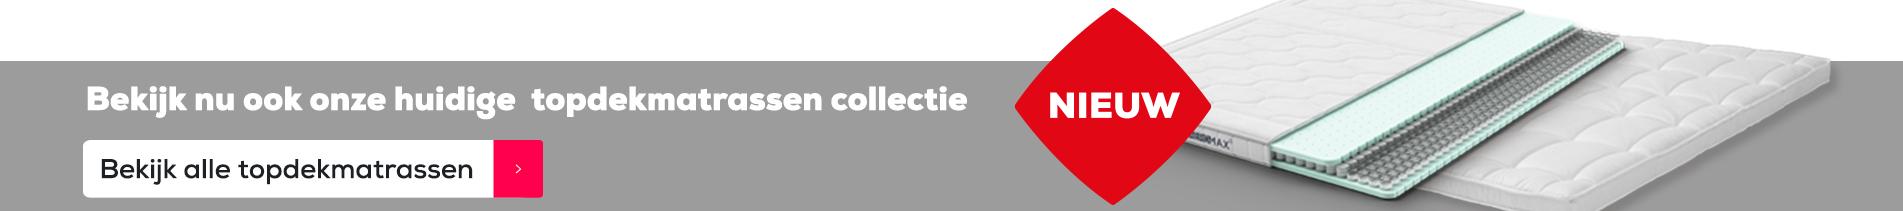 Topper collectie   Swiss Sense